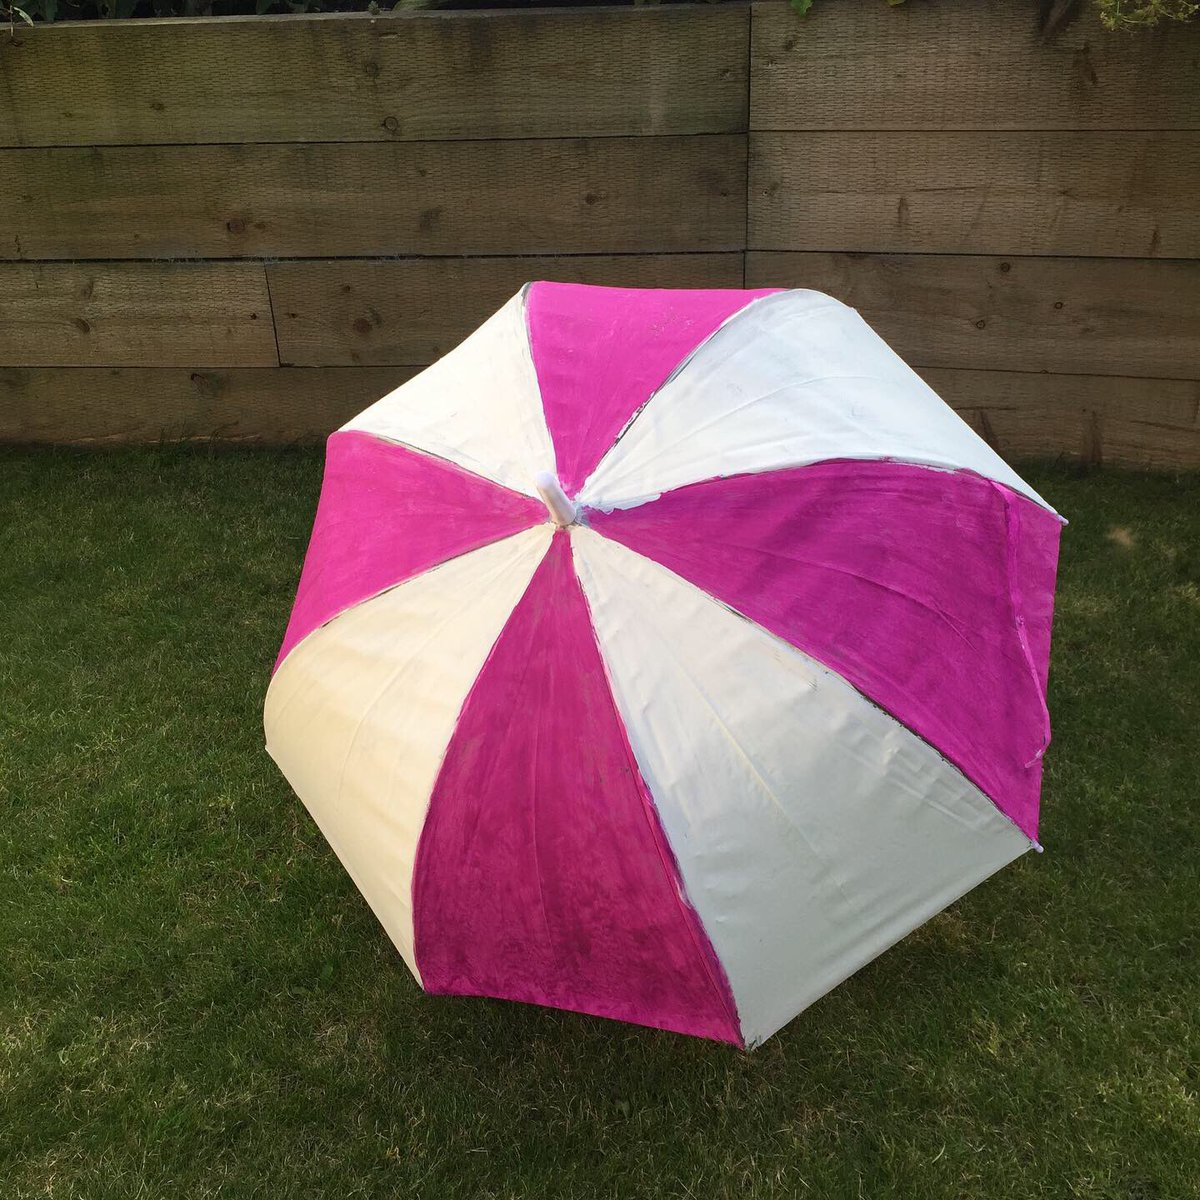 umbrellas hashtag on Twitter